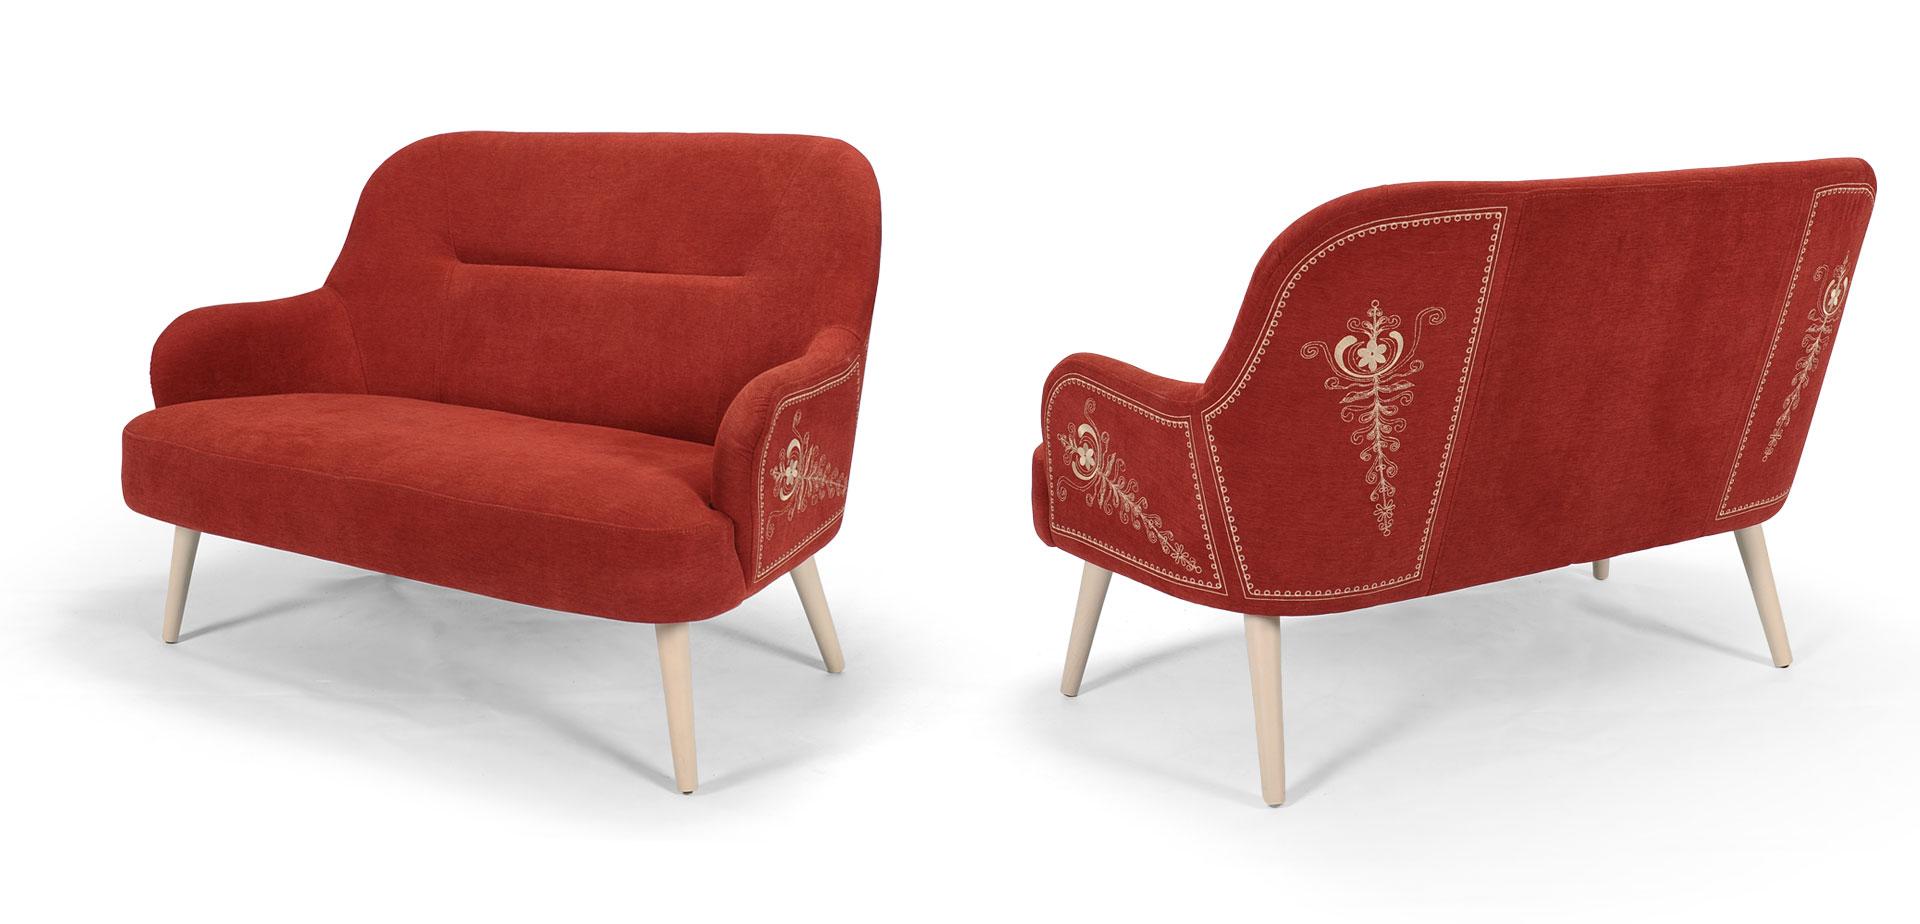 teleorman-scaun-si-masa-06.jpg